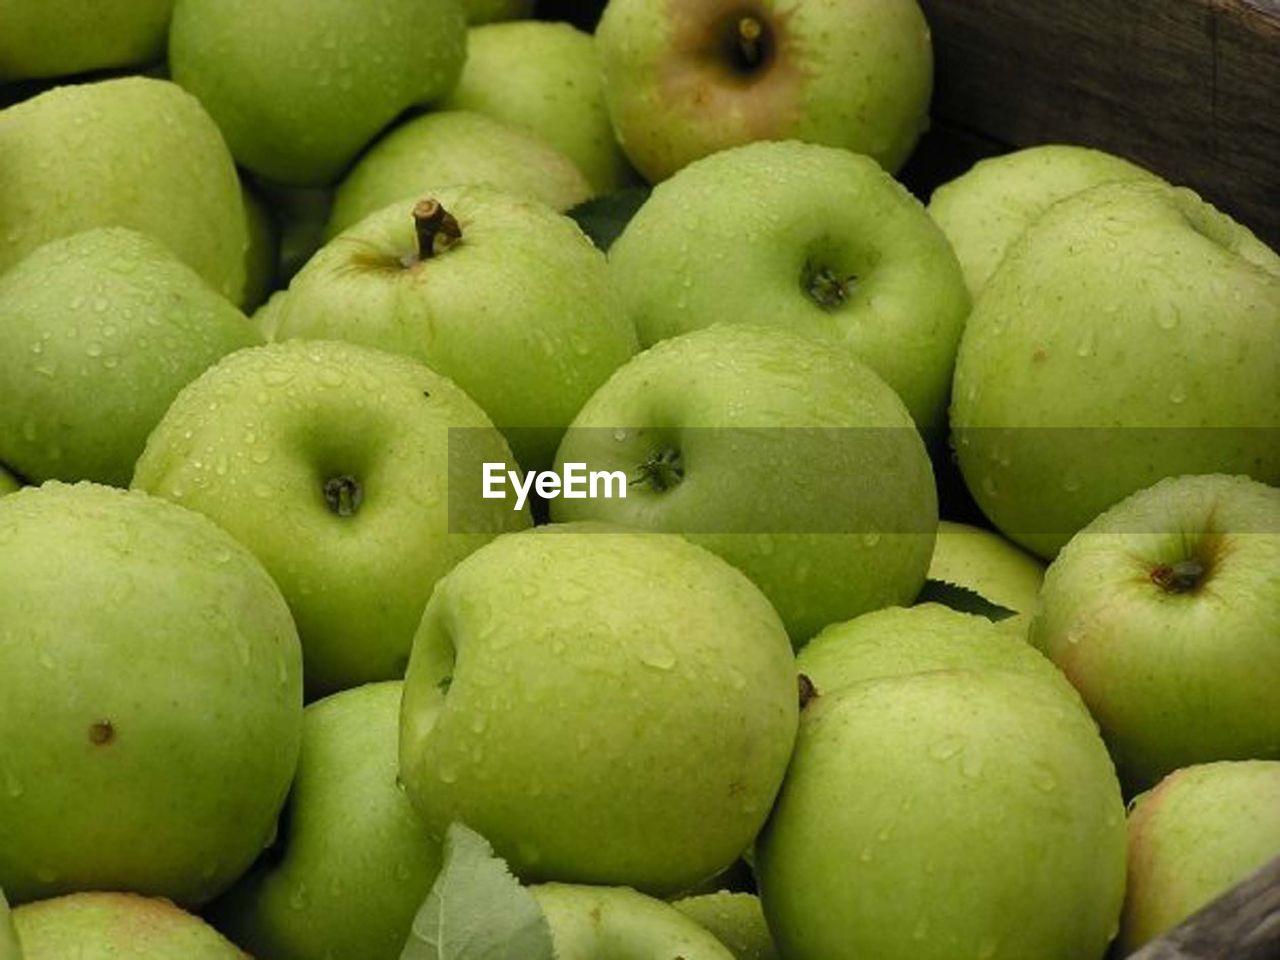 Wet Granny Smith Apples In Wicker Basket